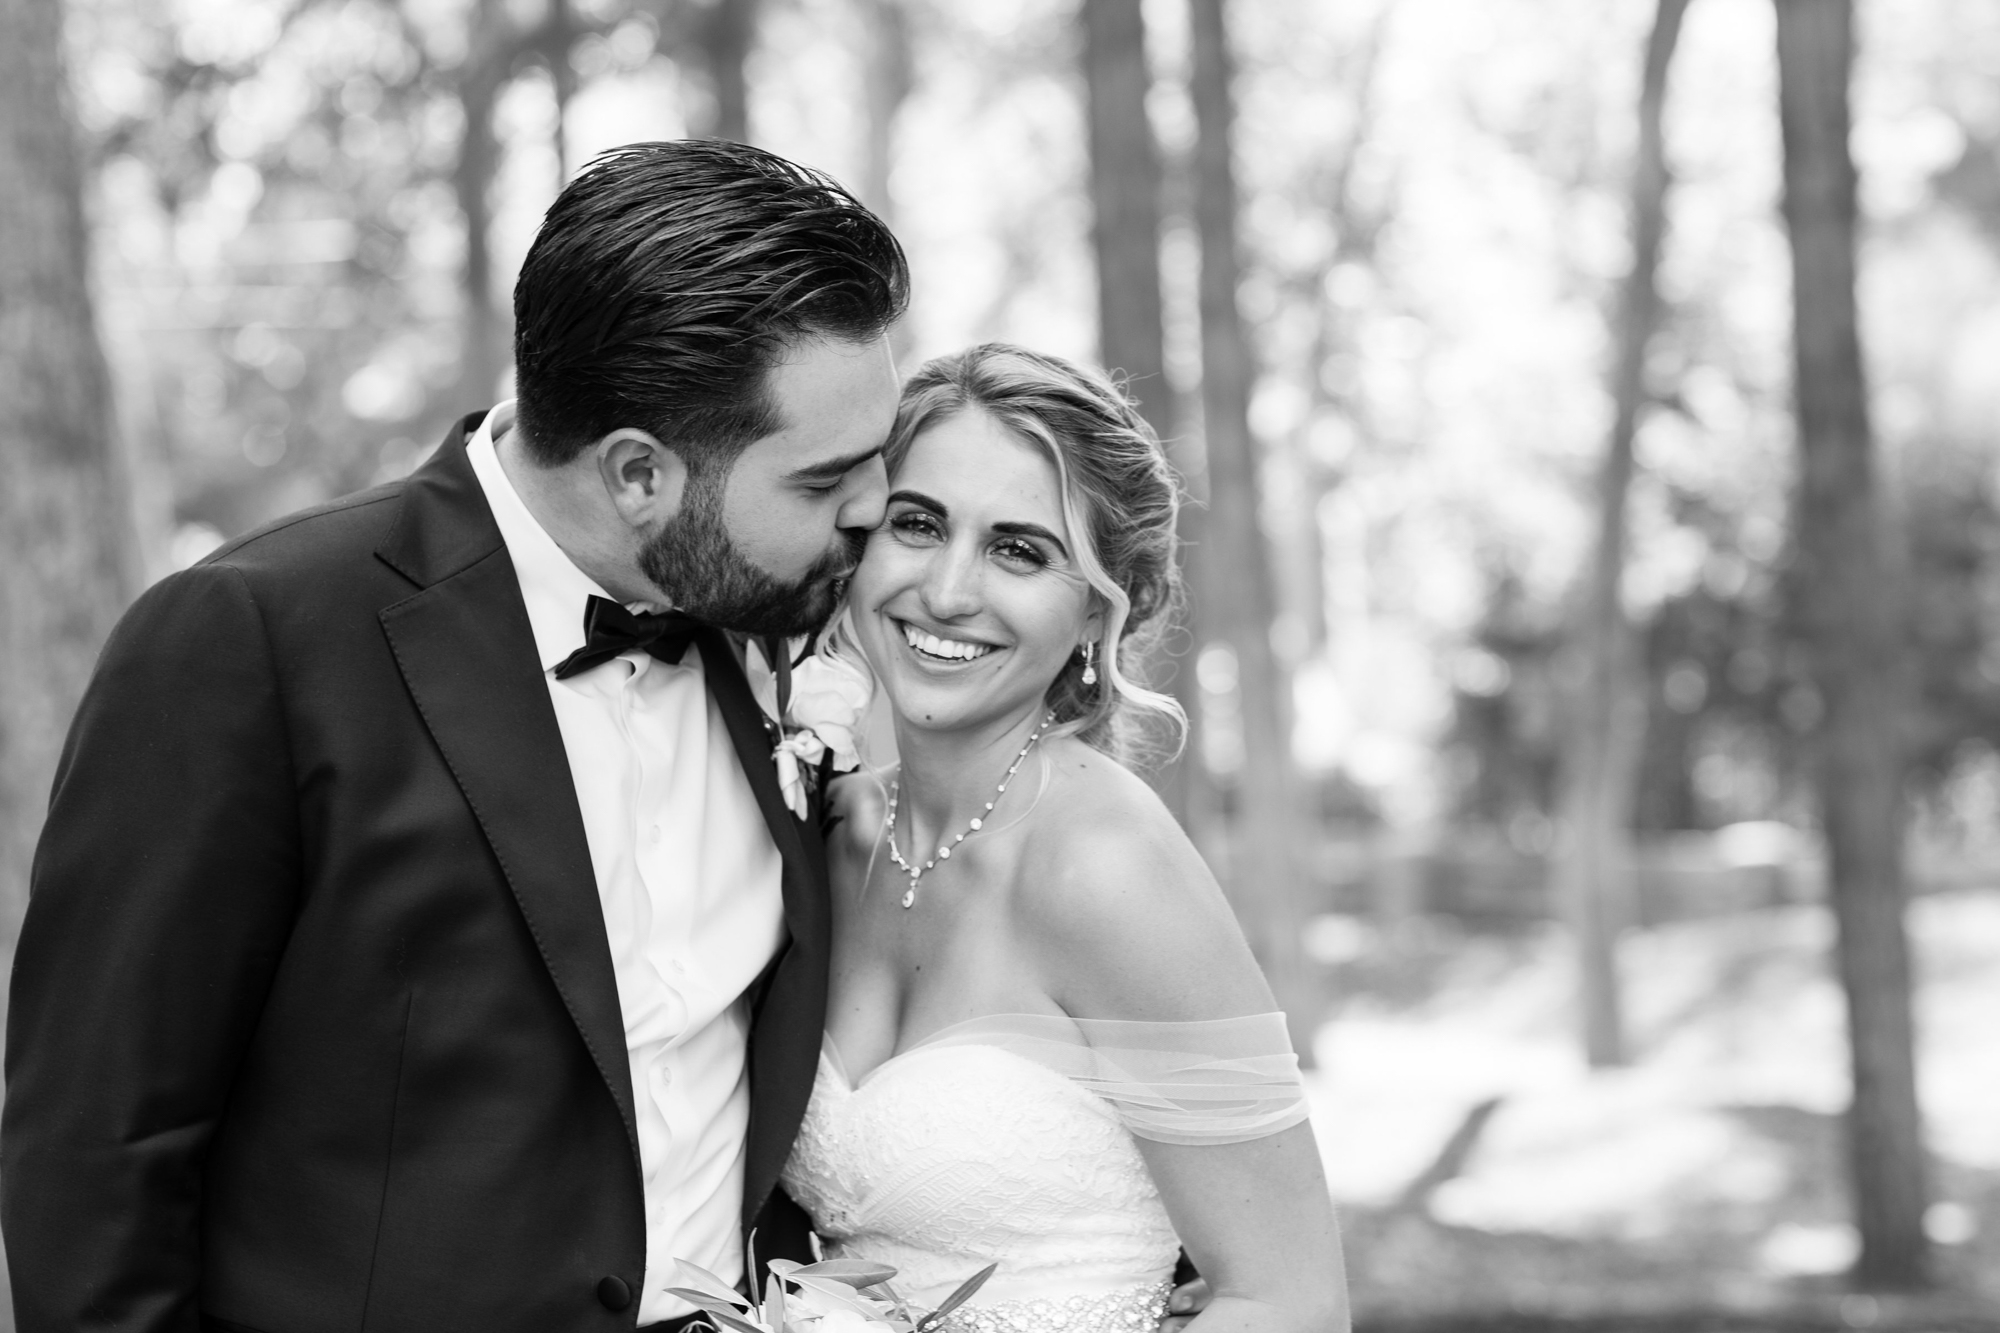 greek-wedding-salt-lake-city-utah-31.jpg